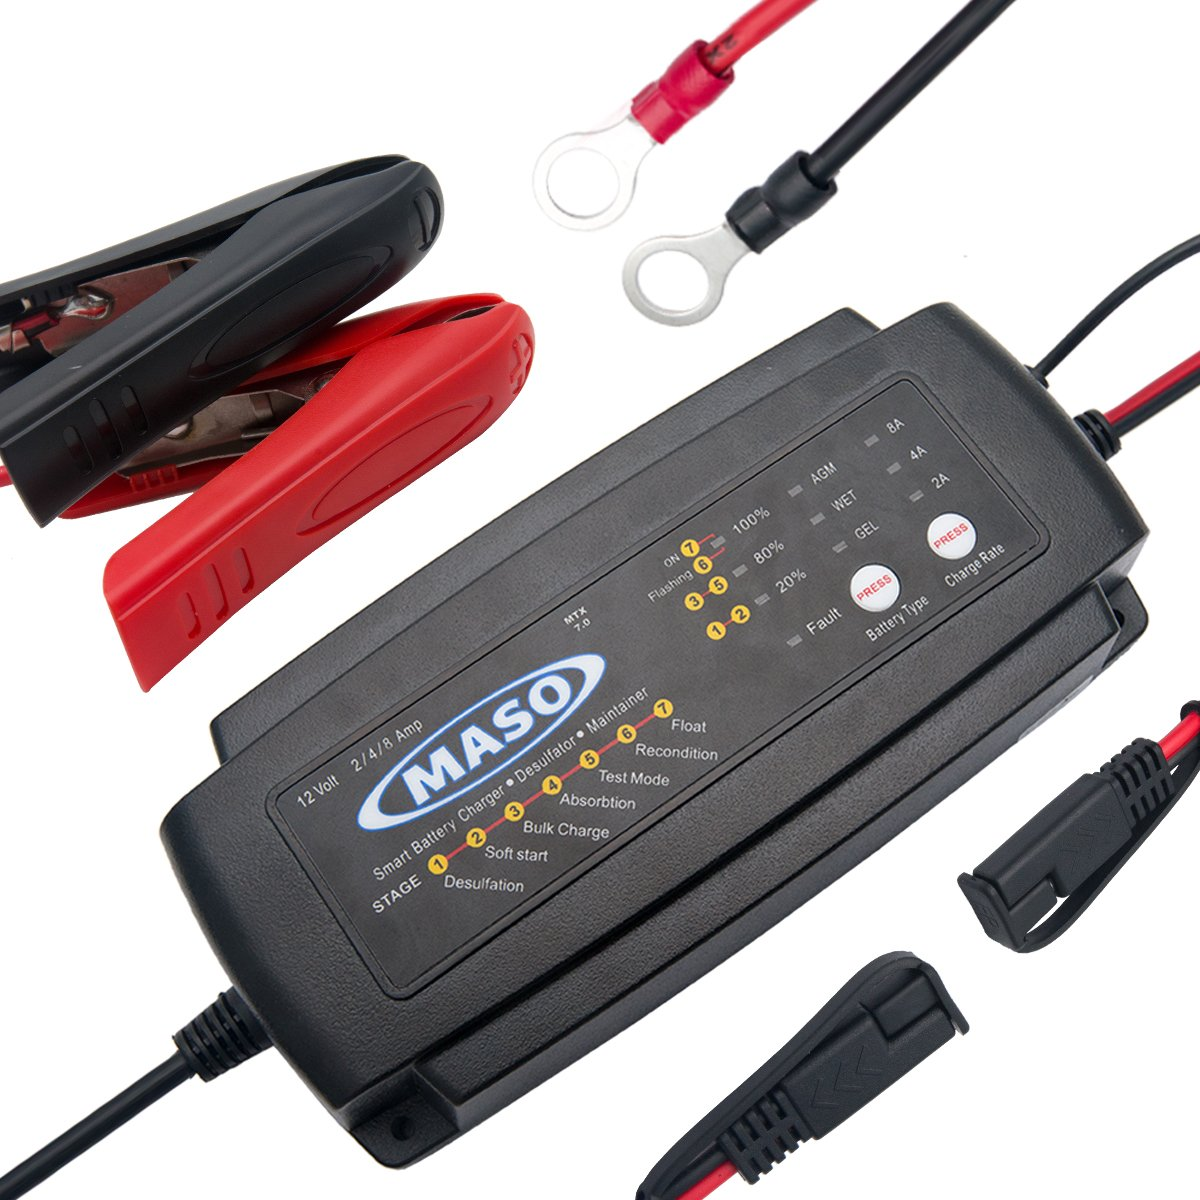 6.3mm Ctek CTE-56260 Ctek Direct Connector Adaptor